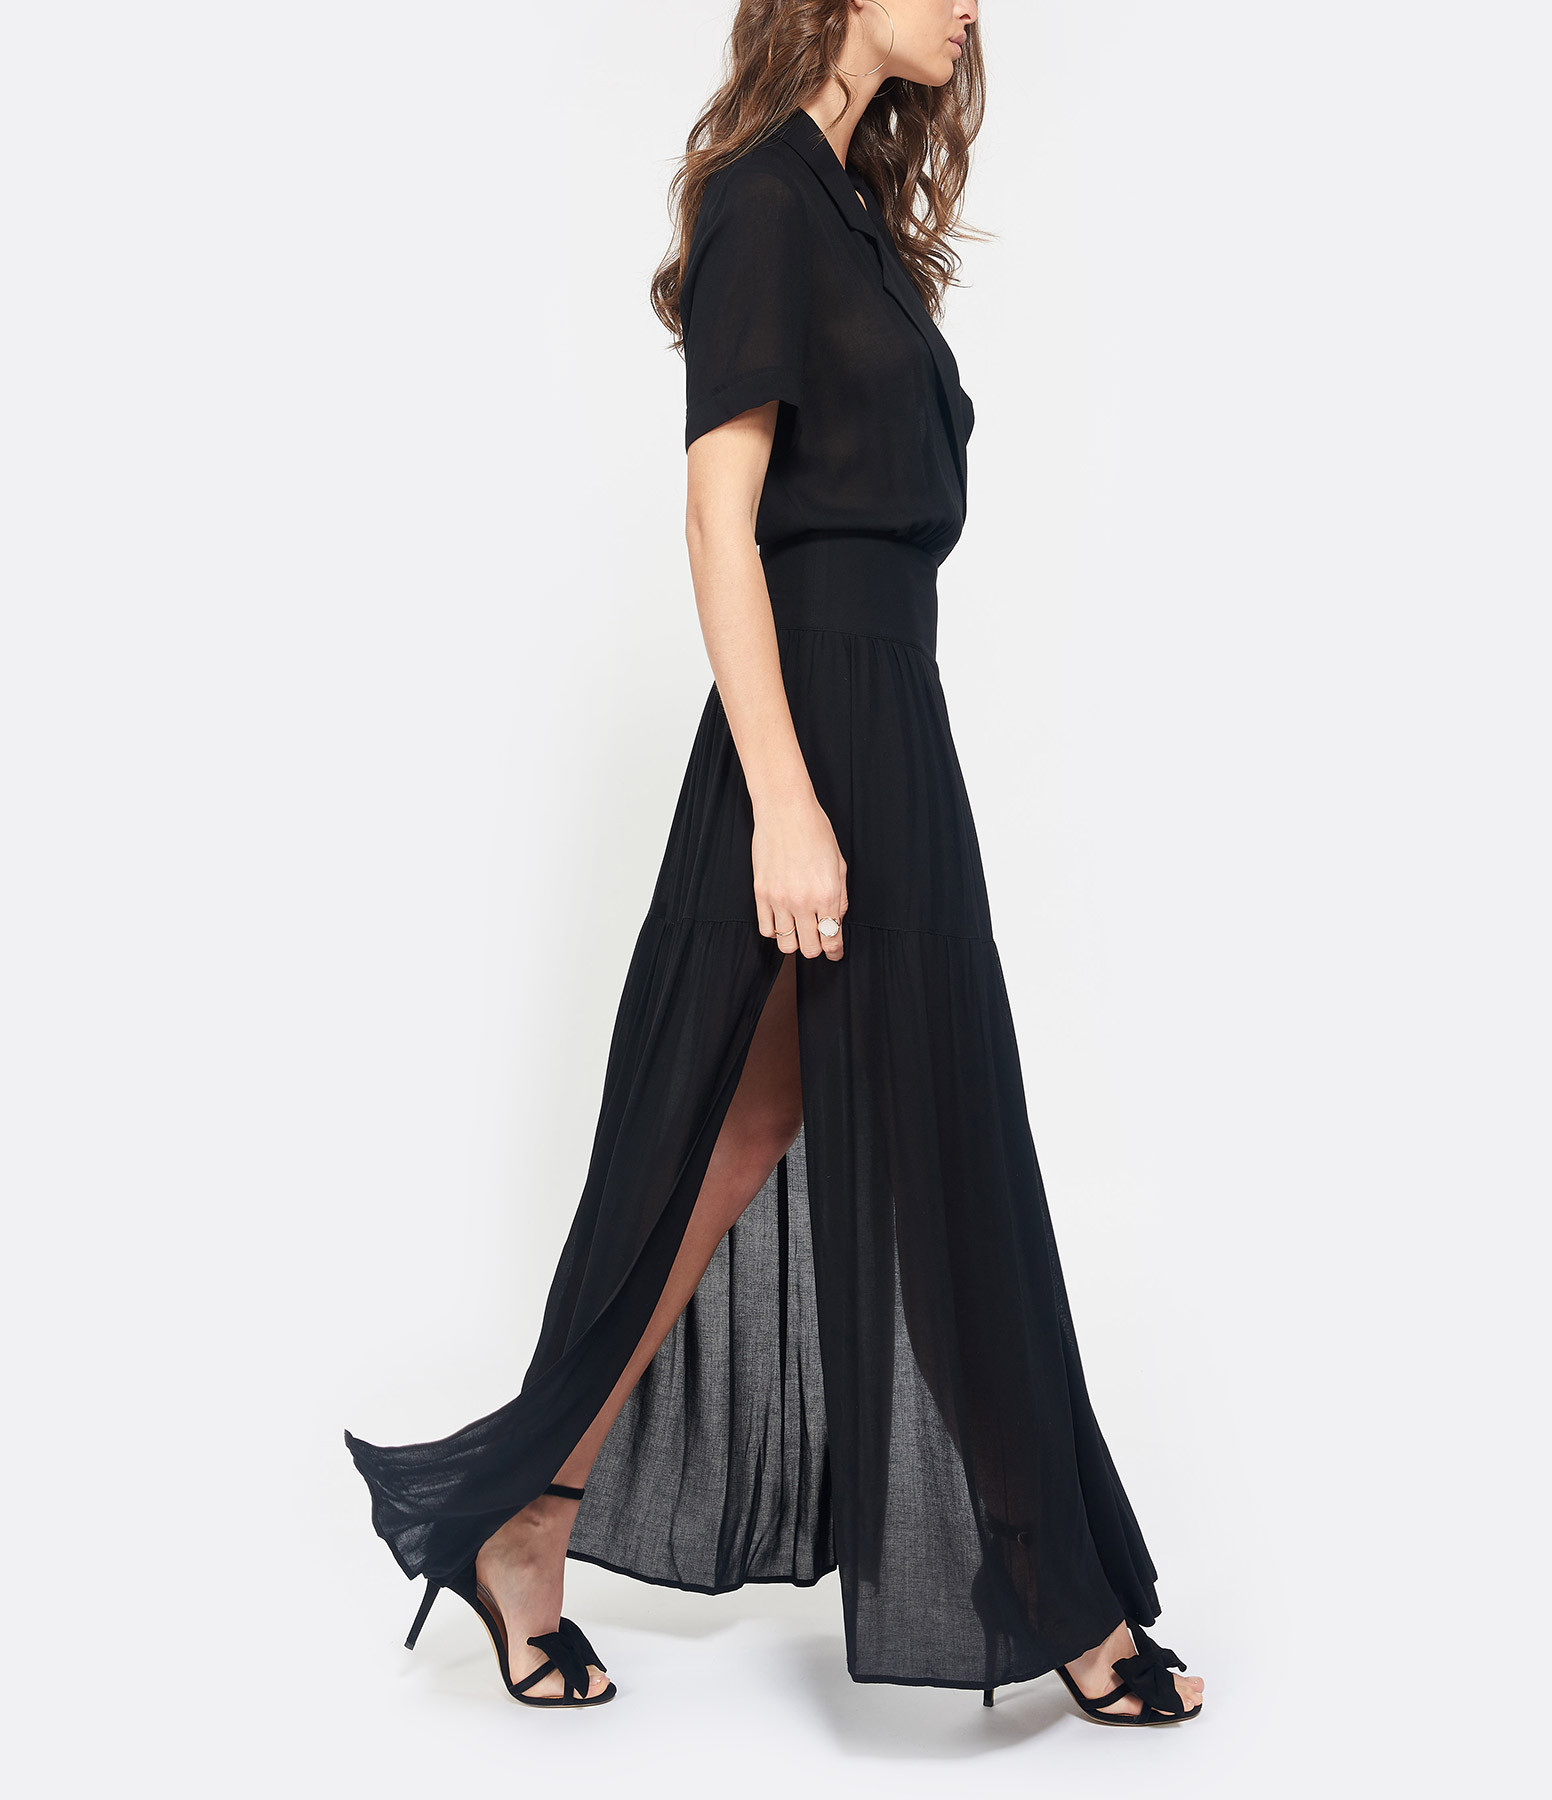 MARGAUX LONNBERG - Robe Gloria Noir